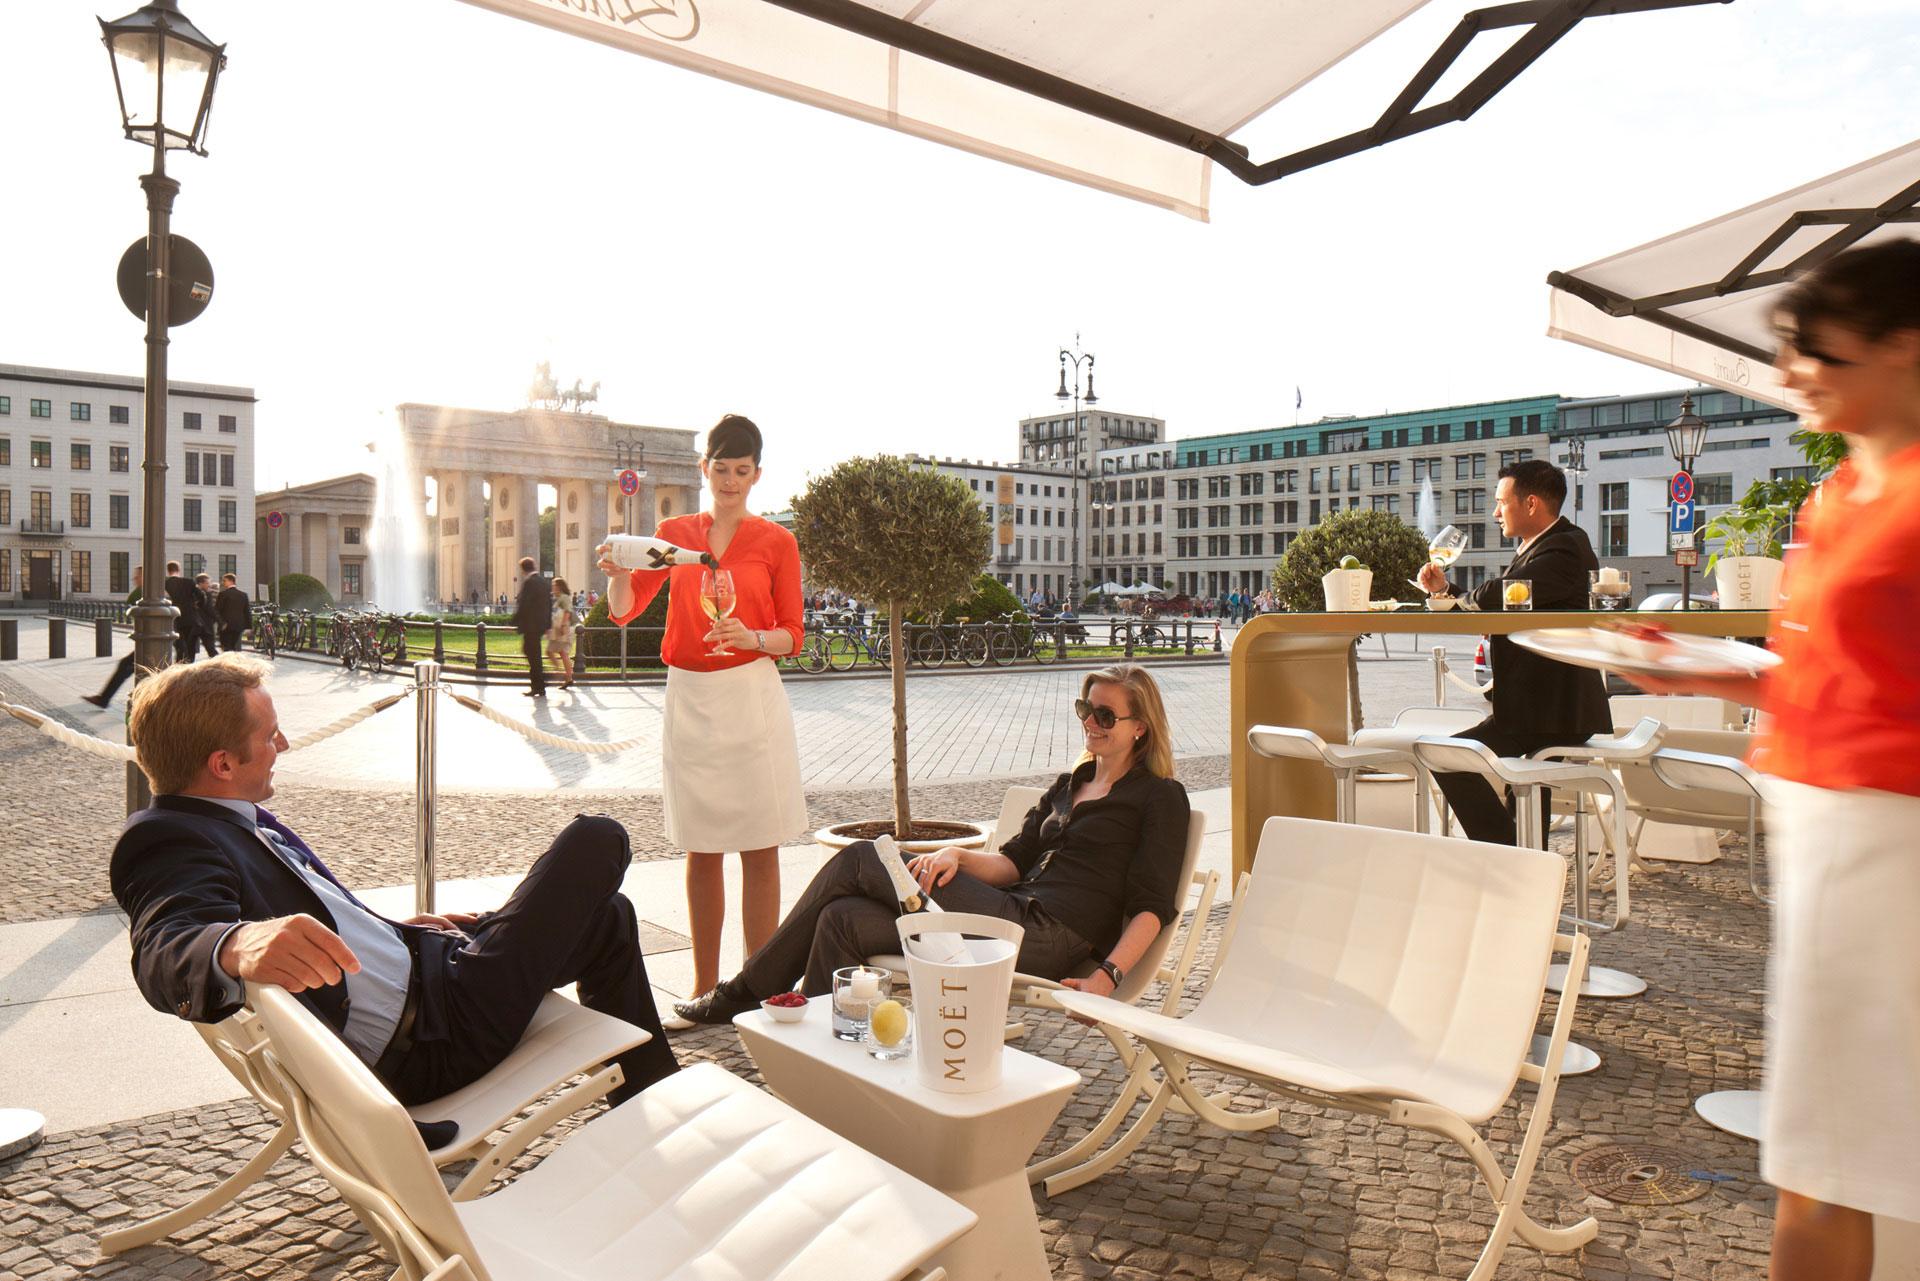 Jamie Ndah Experiences A Luxurious Stay In Beautiful Berlin 4